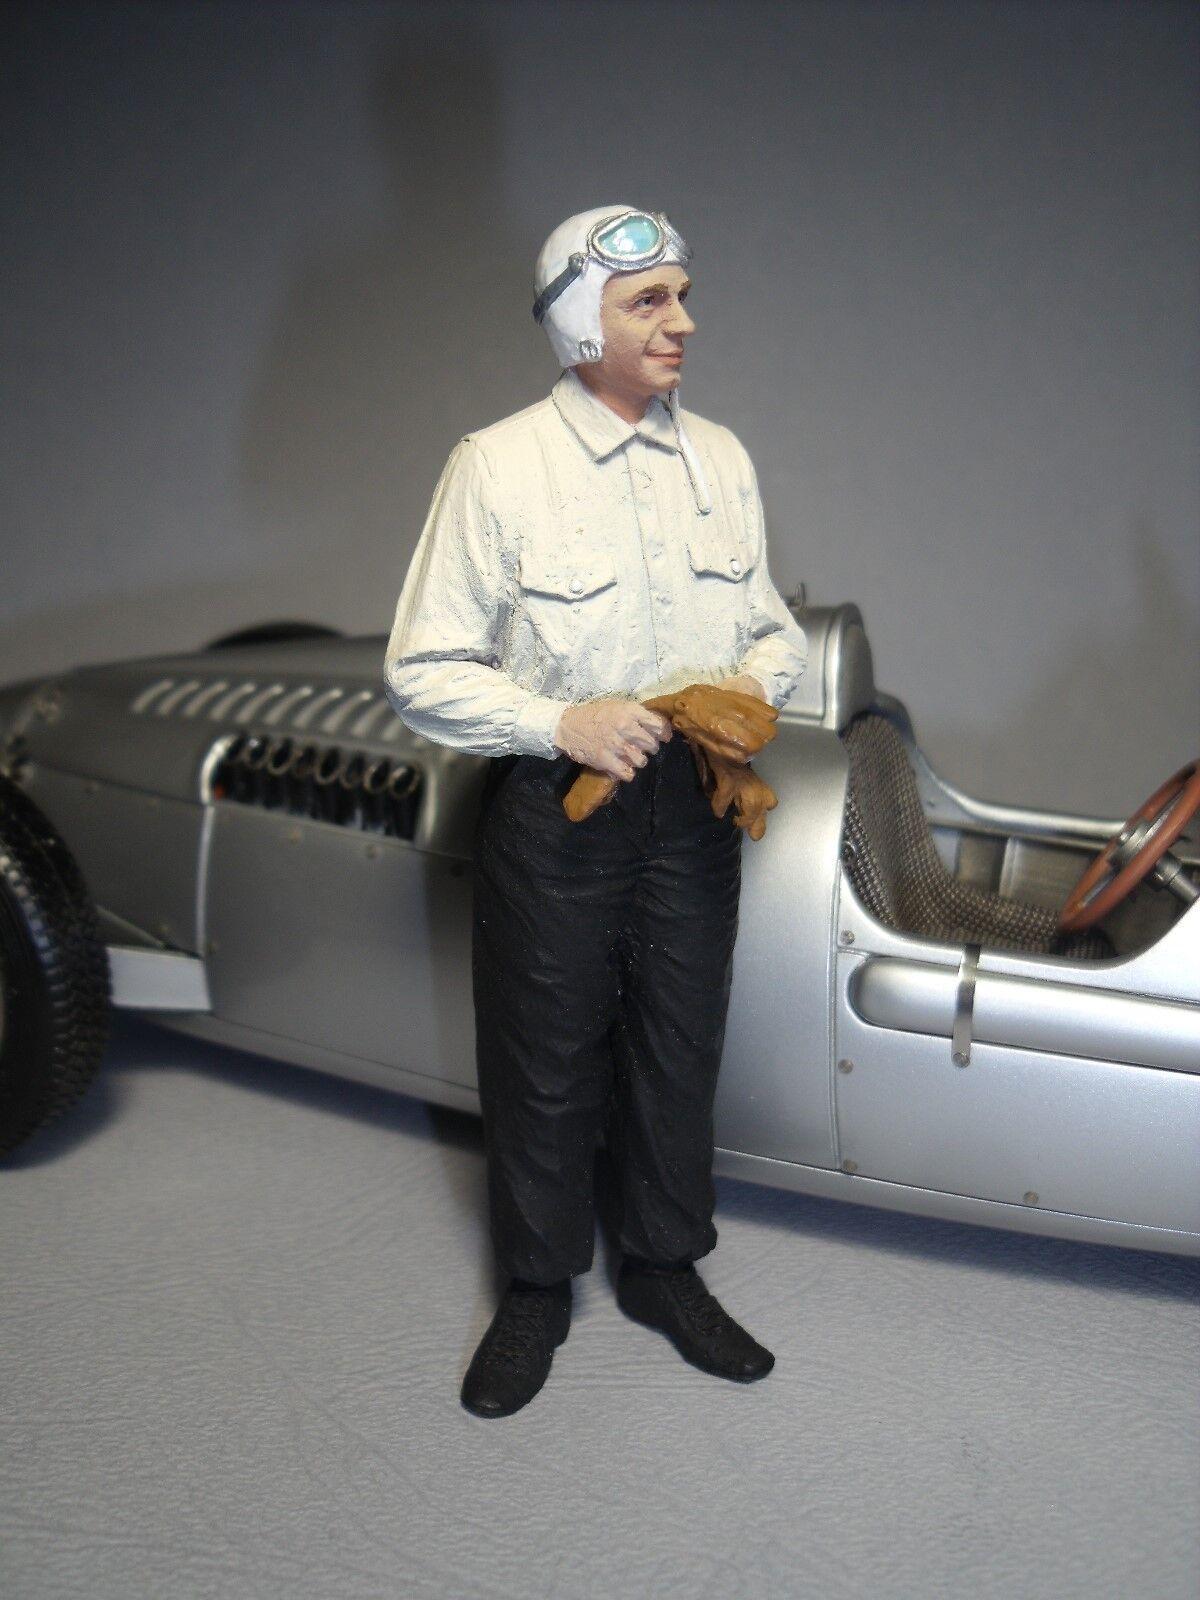 Bernd rosadomeyer 1 1 1 18 sin pintar figura hecha por brooom para CMC Auto Unión bd7007